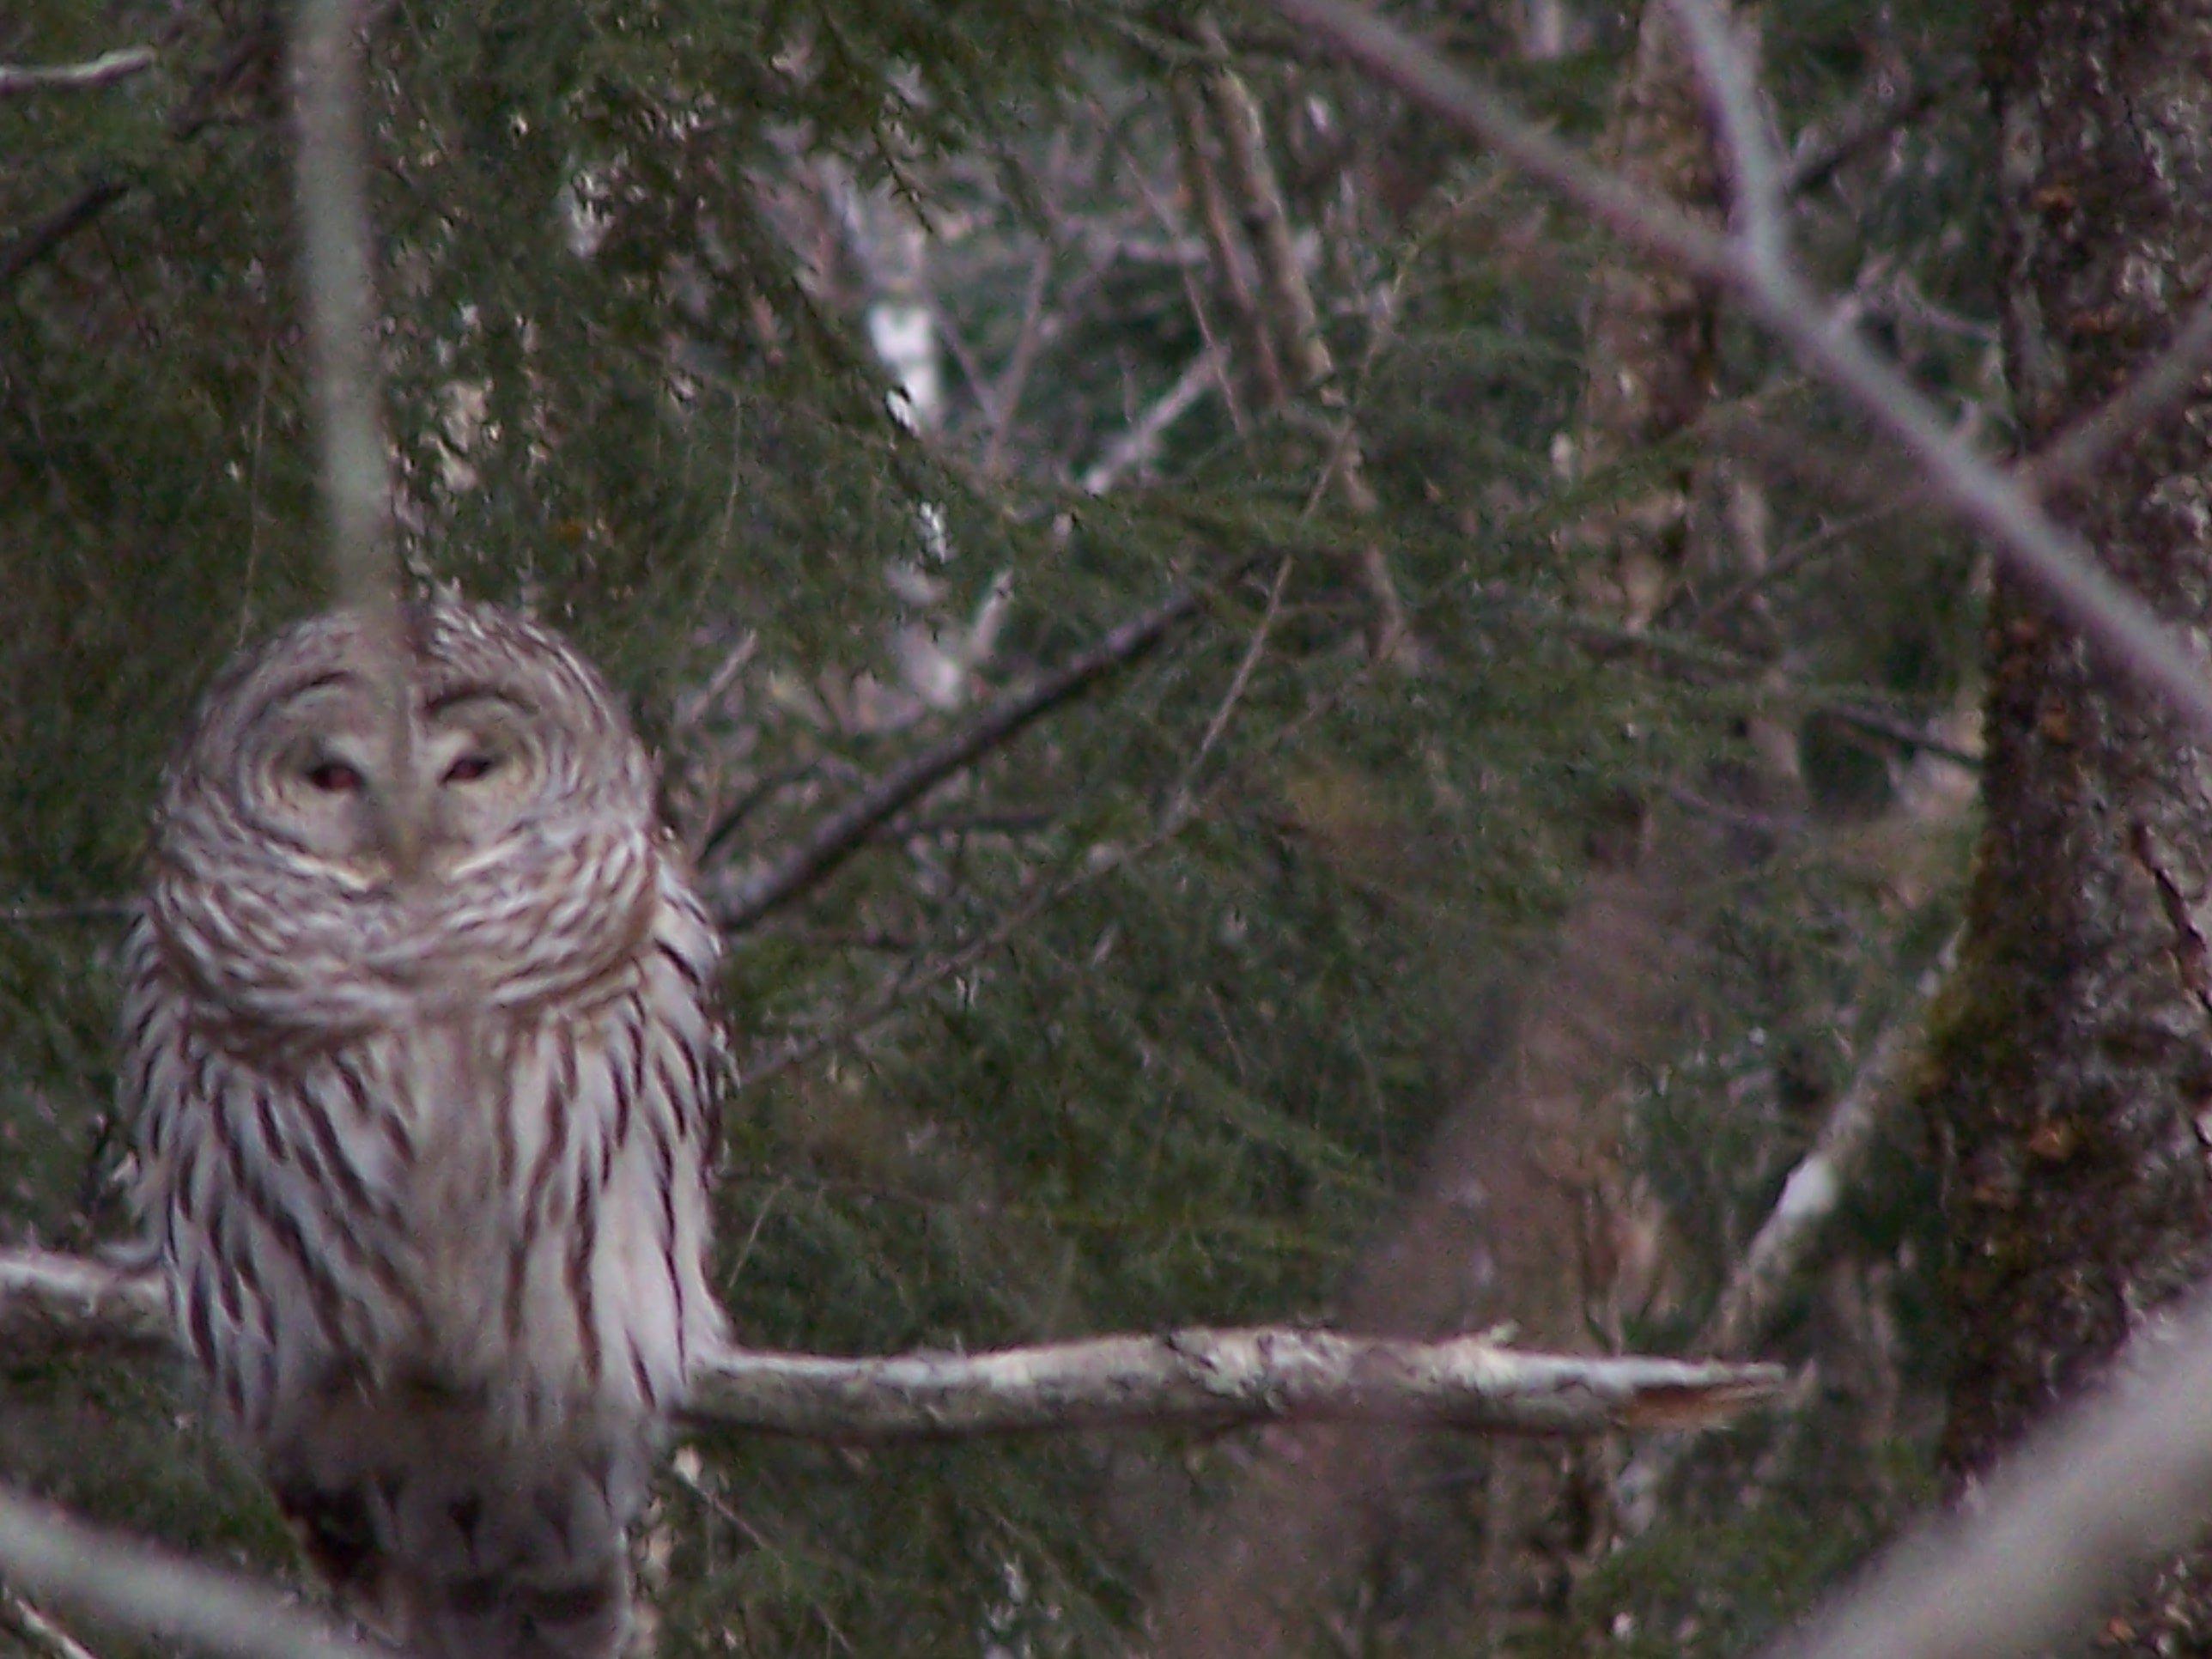 Owl keeping an eye on things